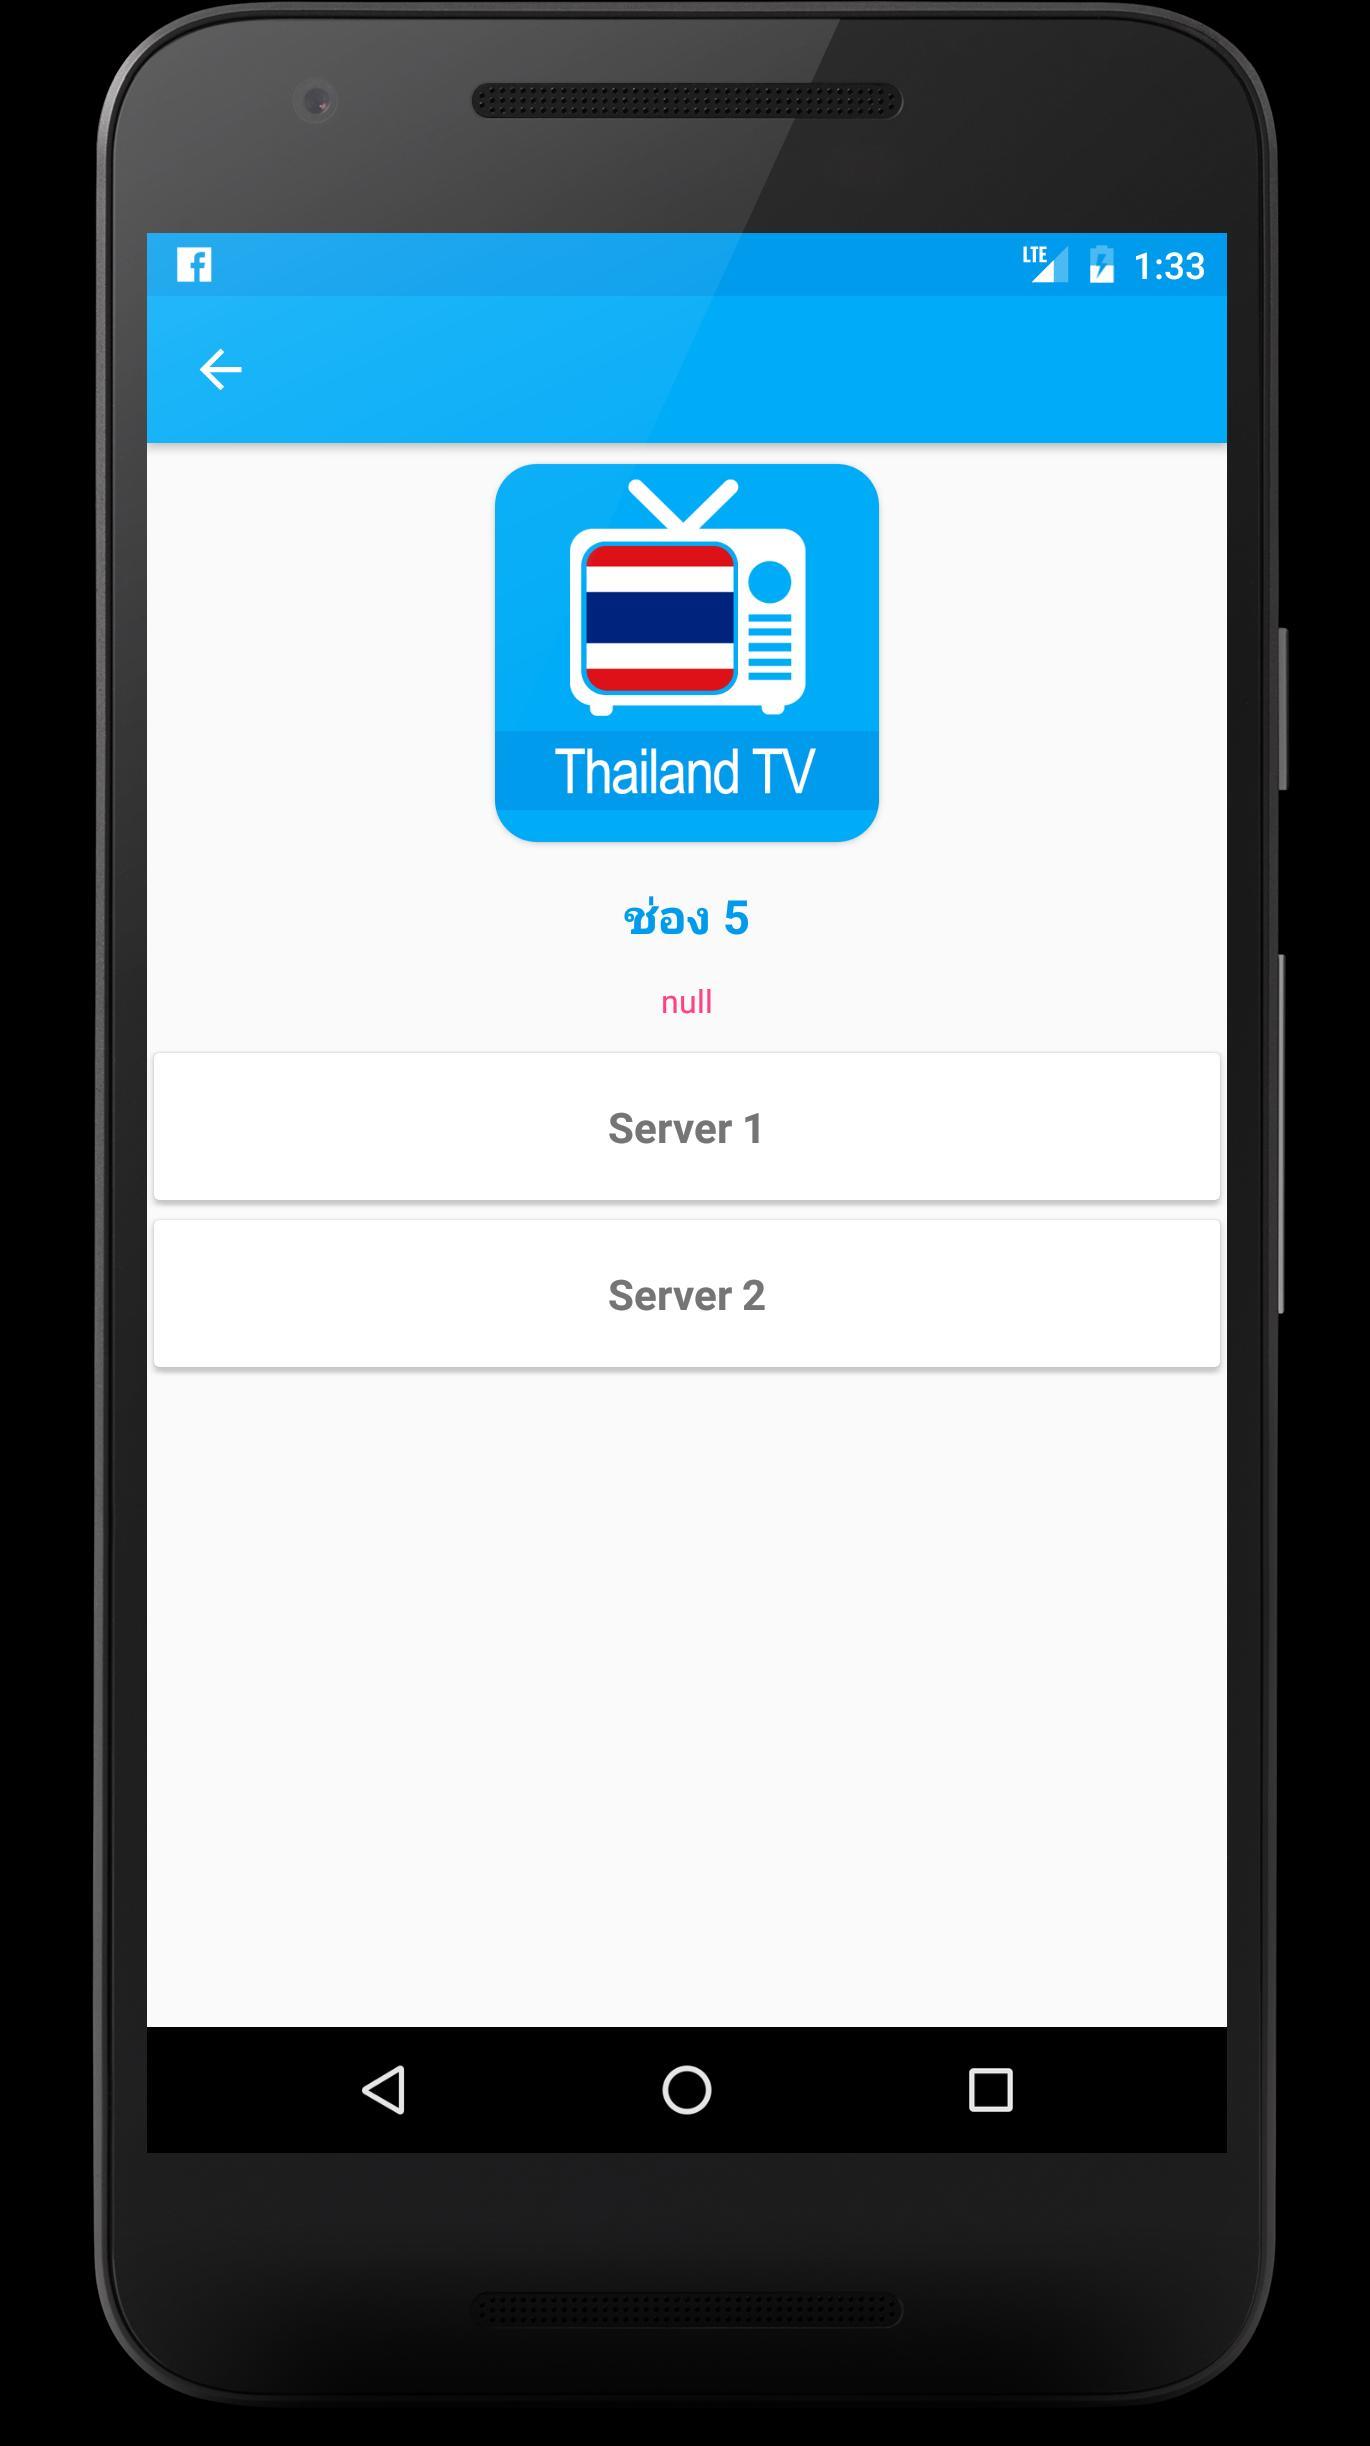 Thailand TV - ดูทีวีออนไลน์ for Android - APK Download